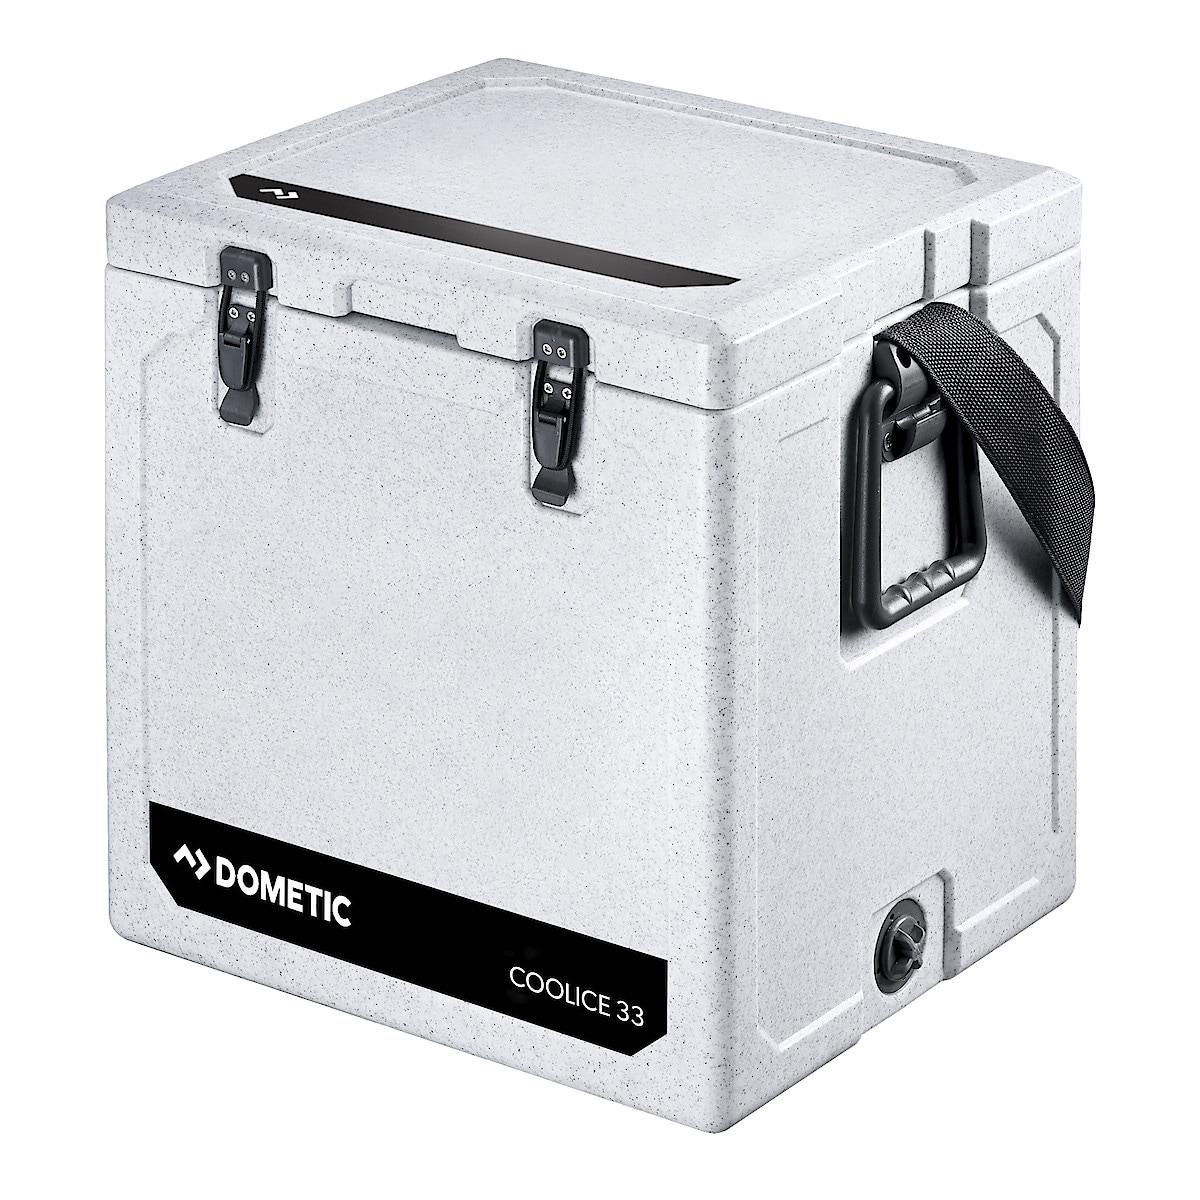 Kylbox Dometic Cool Ice WCI 33